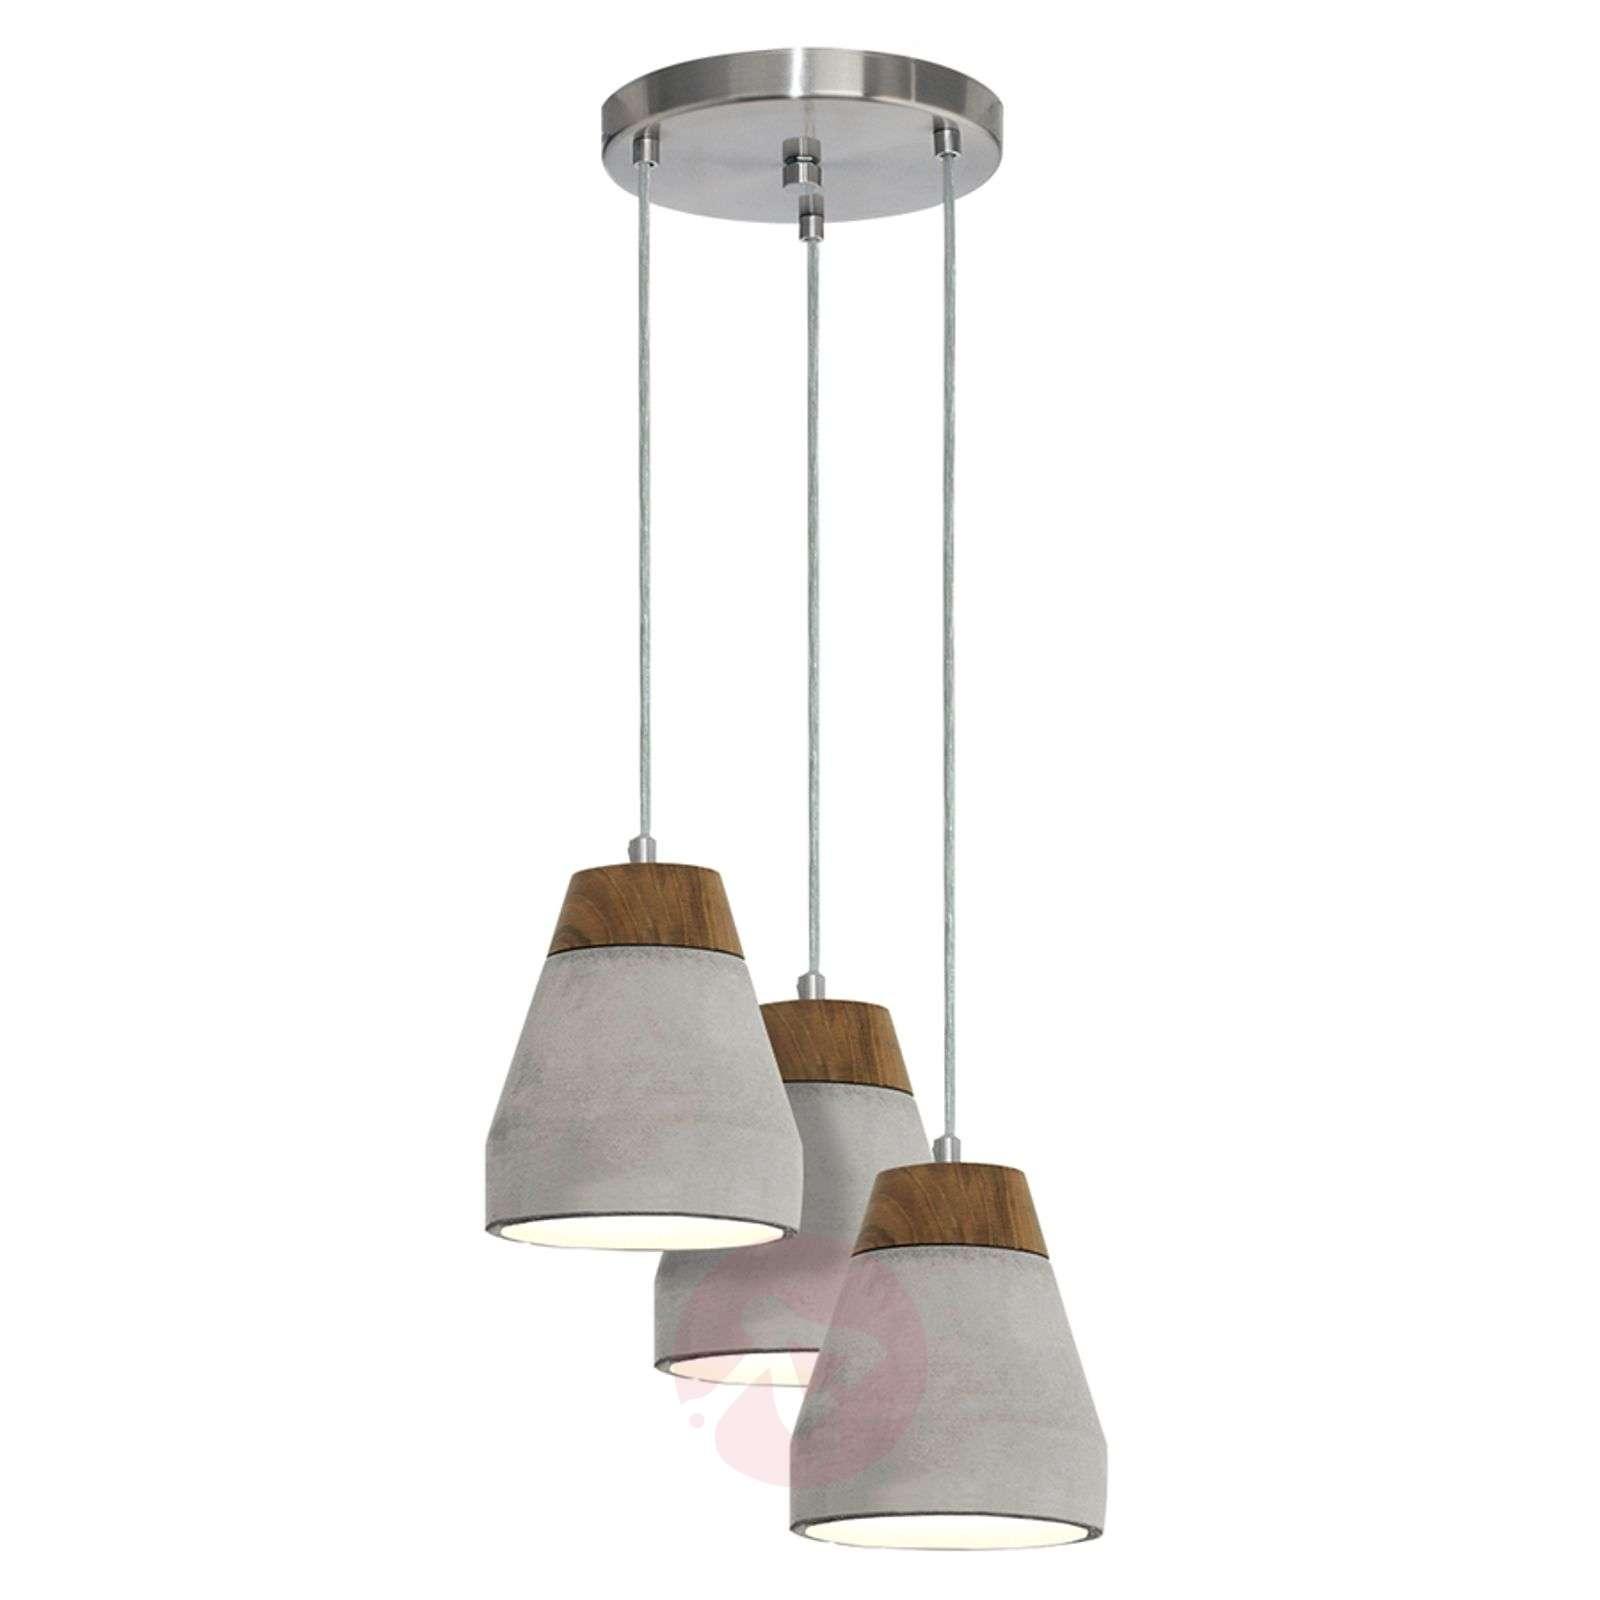 Industrial-looking Tarega pendant light-3031931-01